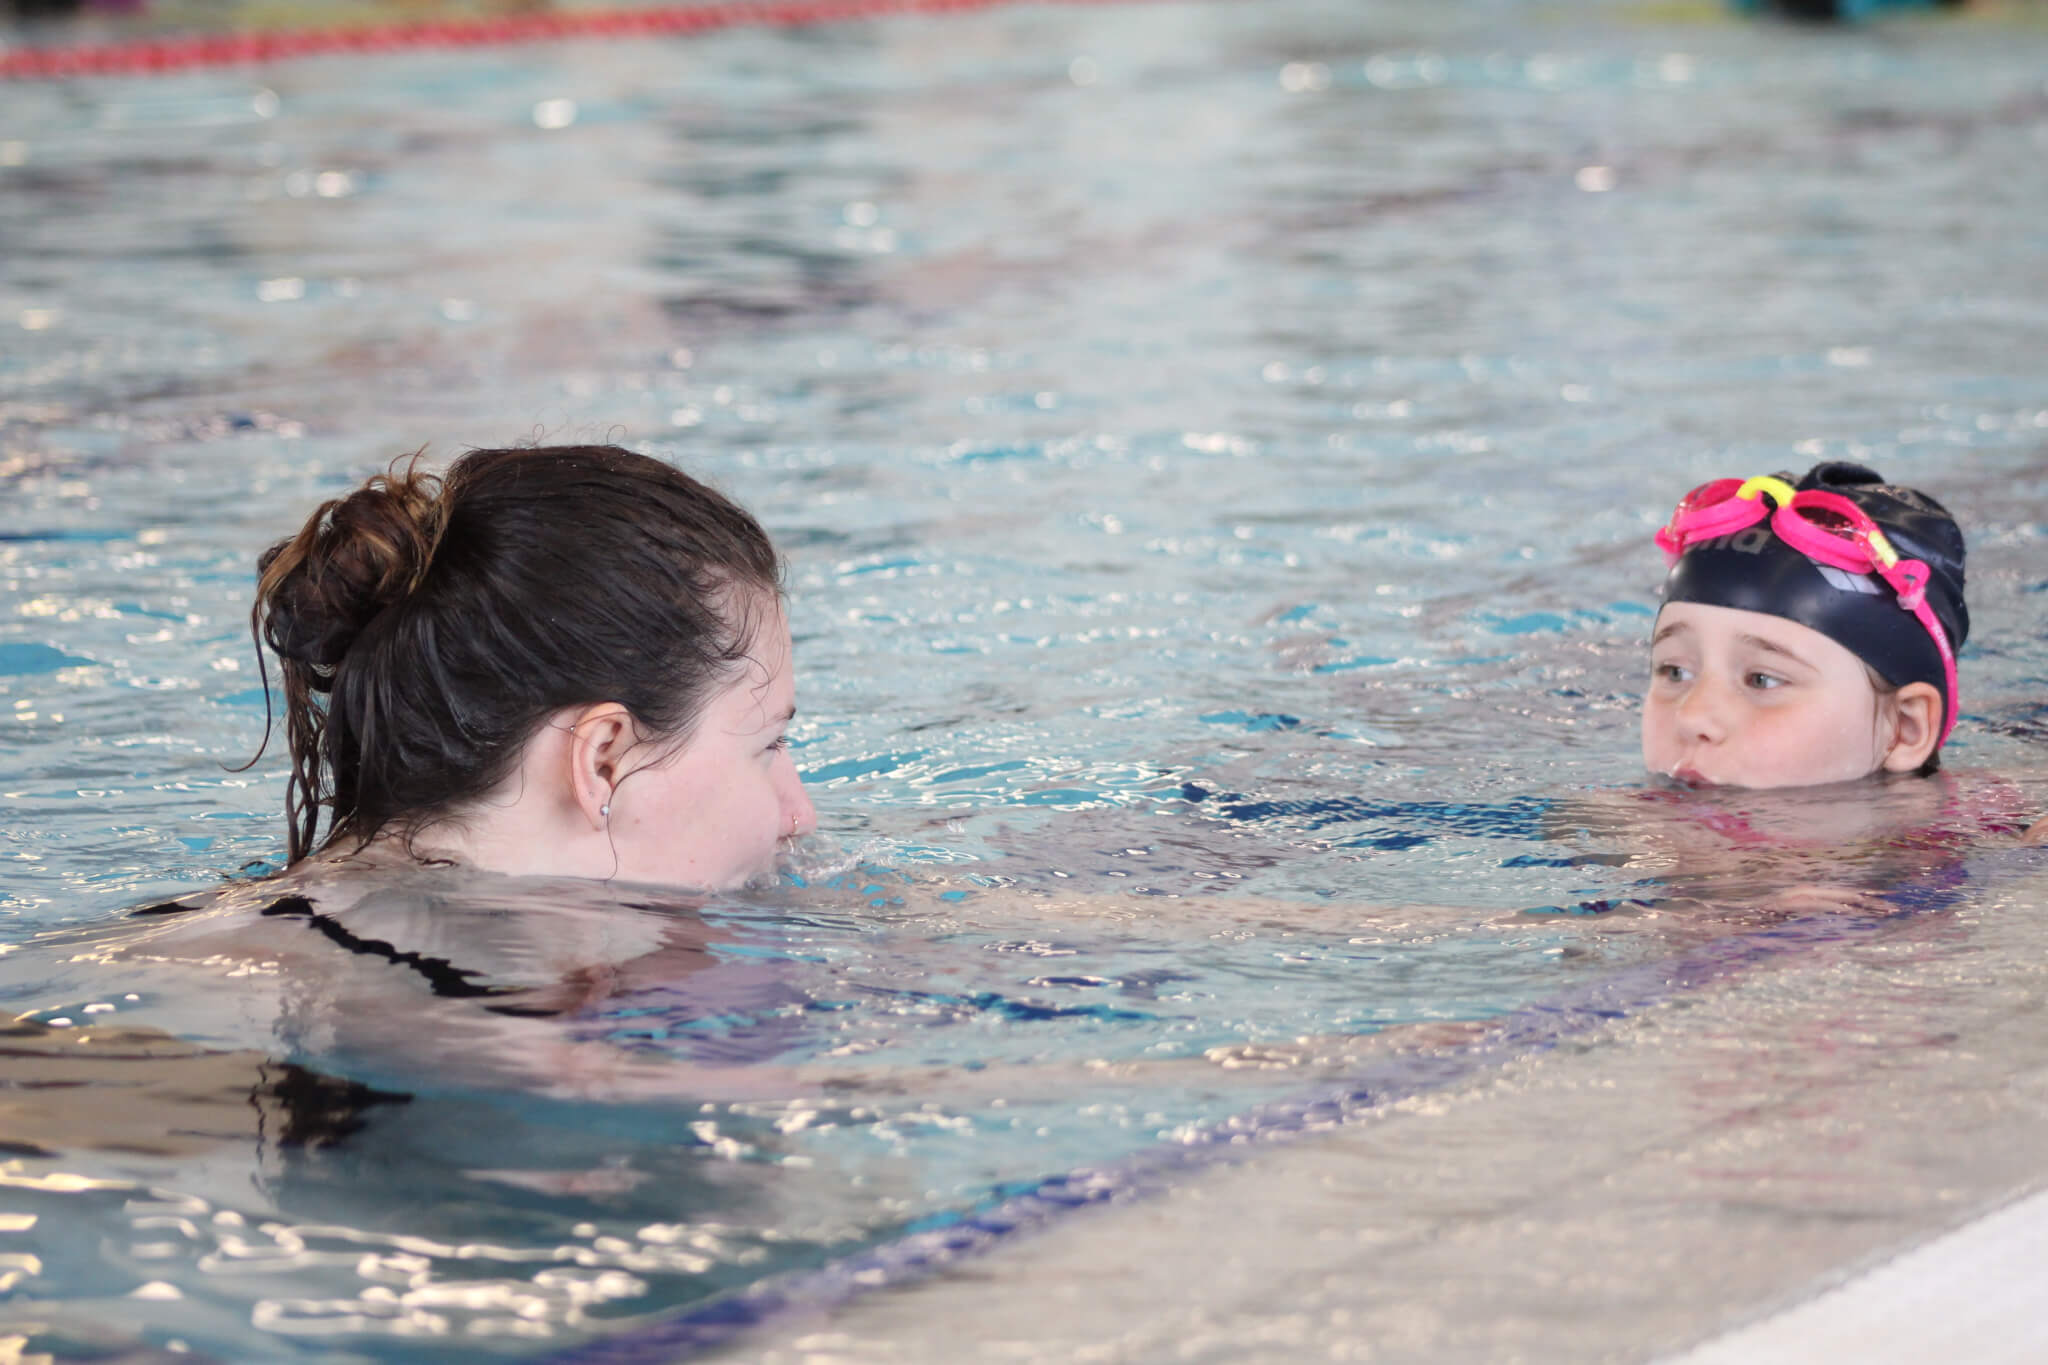 Svømmekurs barn bøler